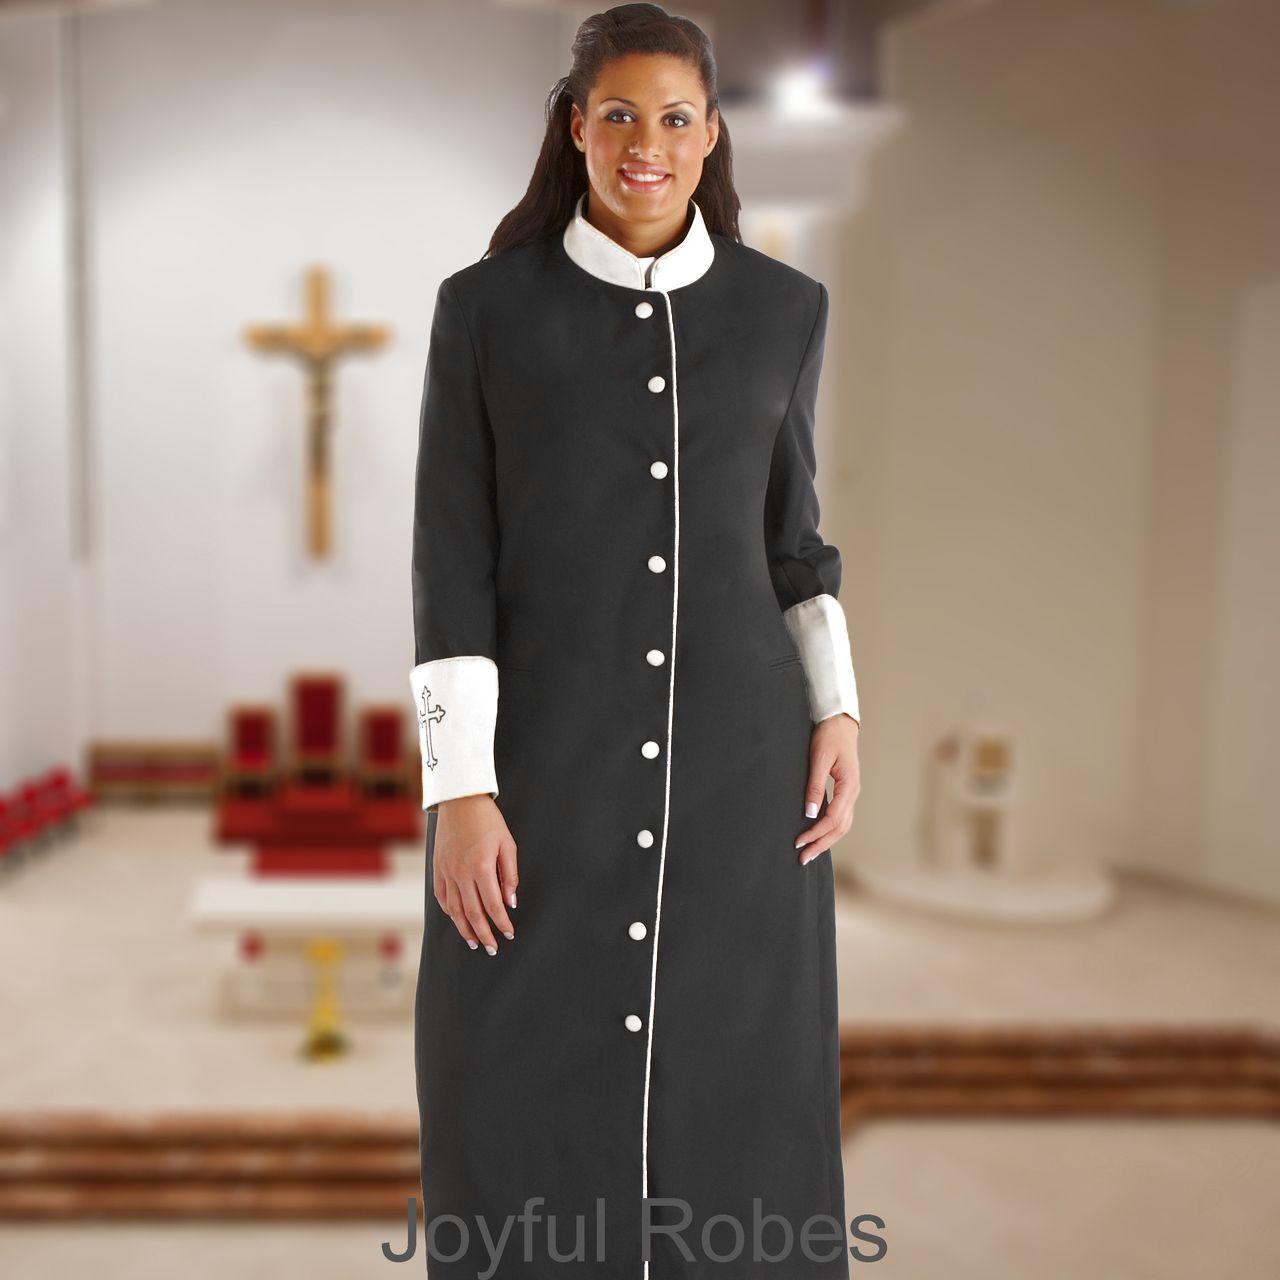 305 W. Women's Clergy/Pastor Robe - Black/White Cuff